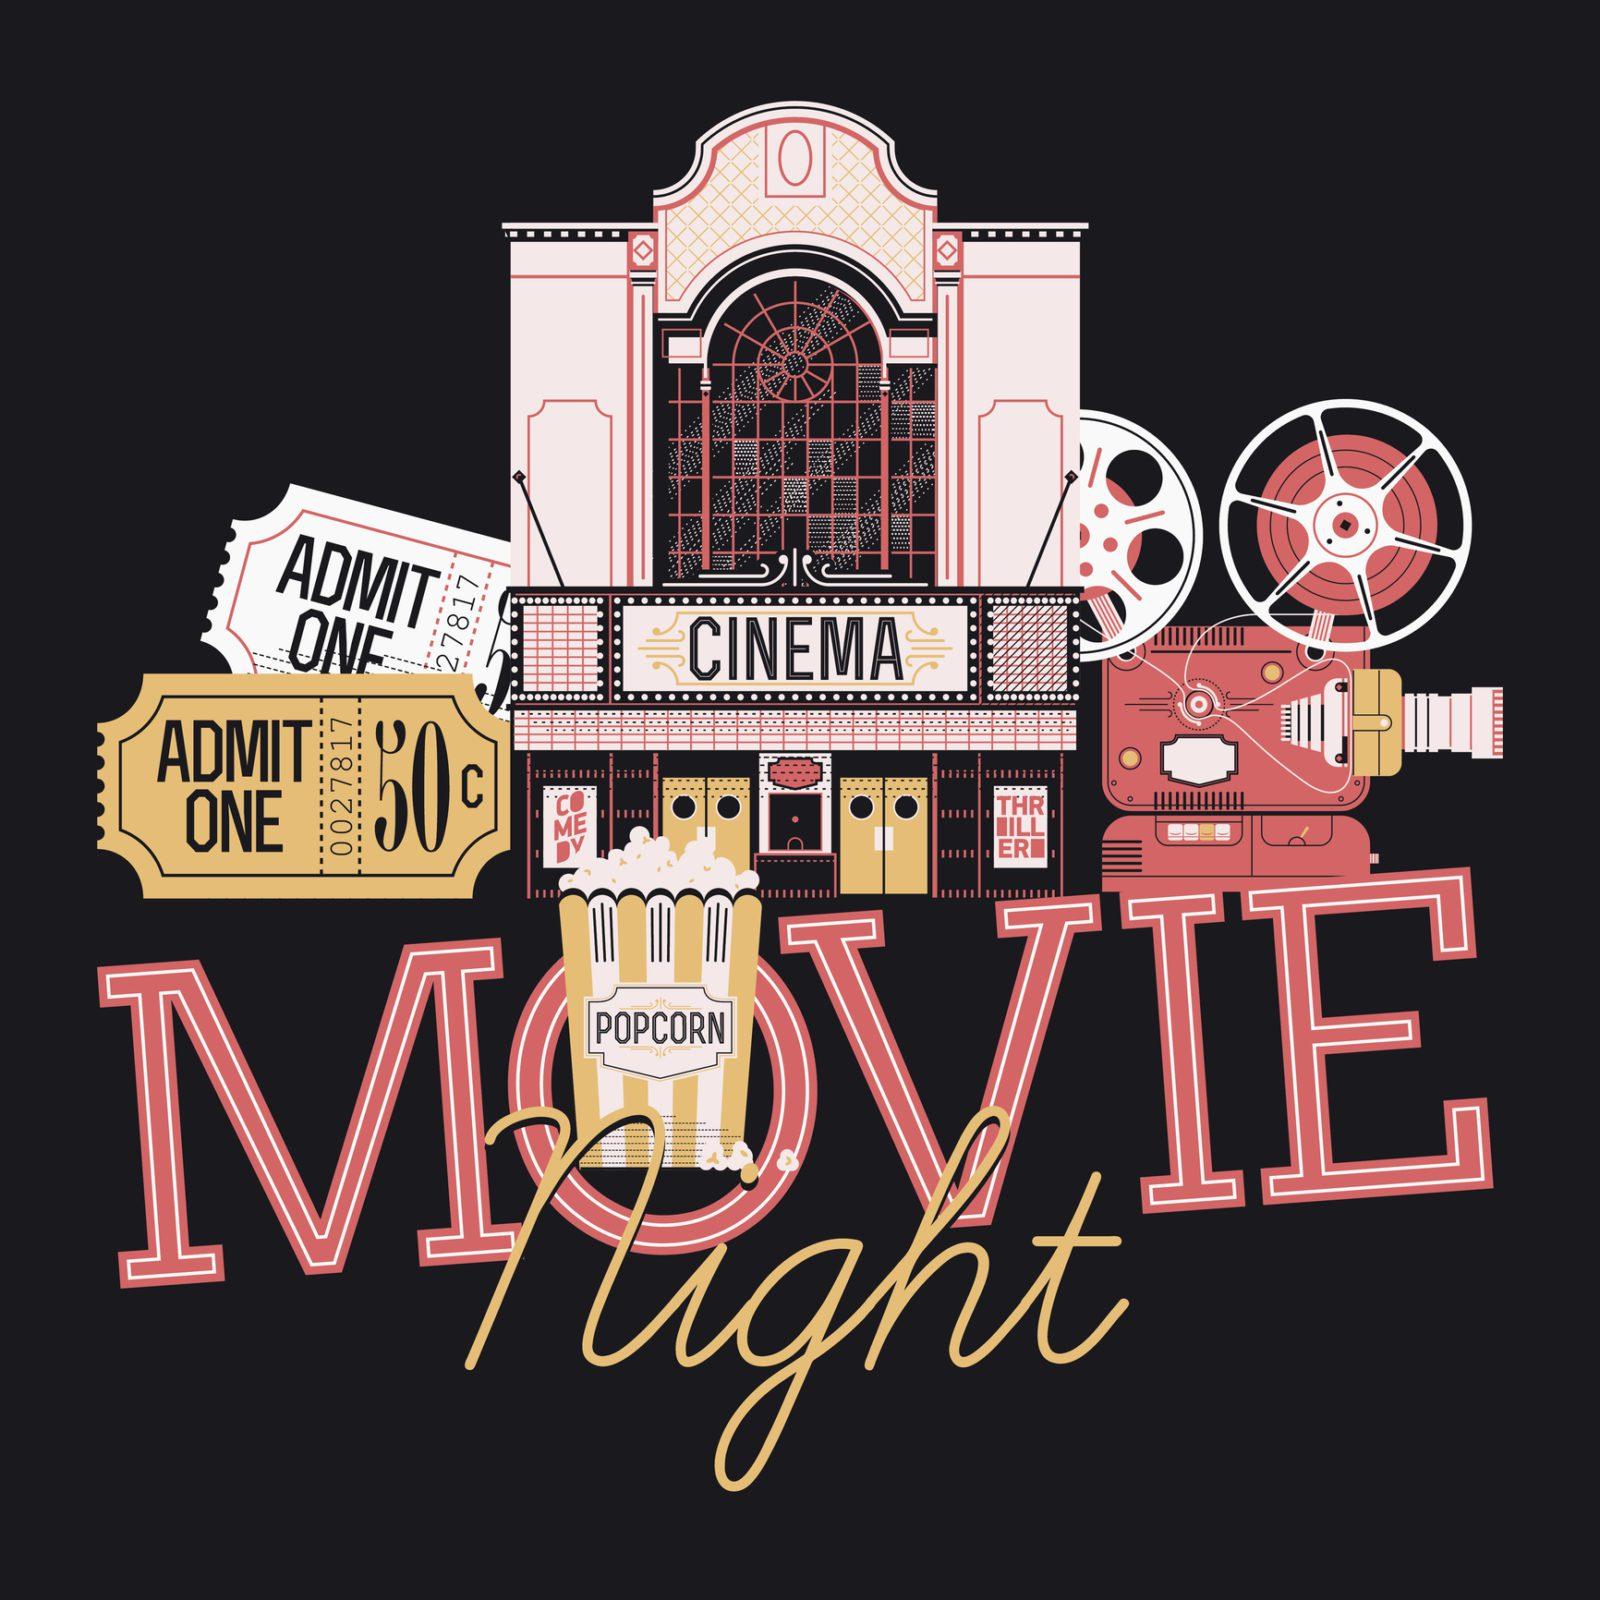 Movie night graphic